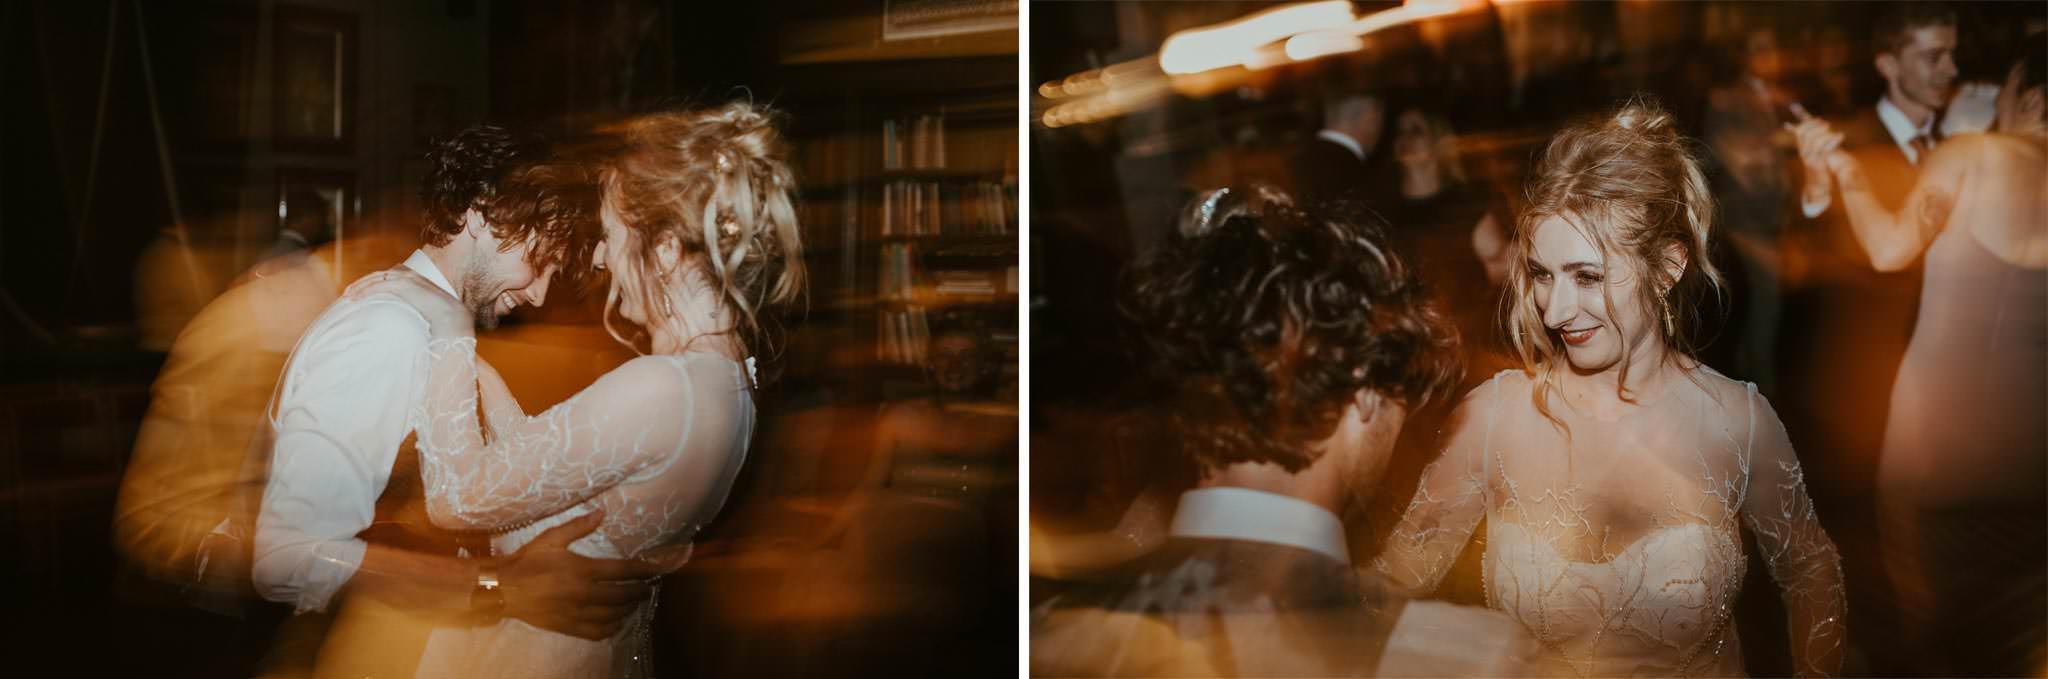 destination-wedding-photographer-200